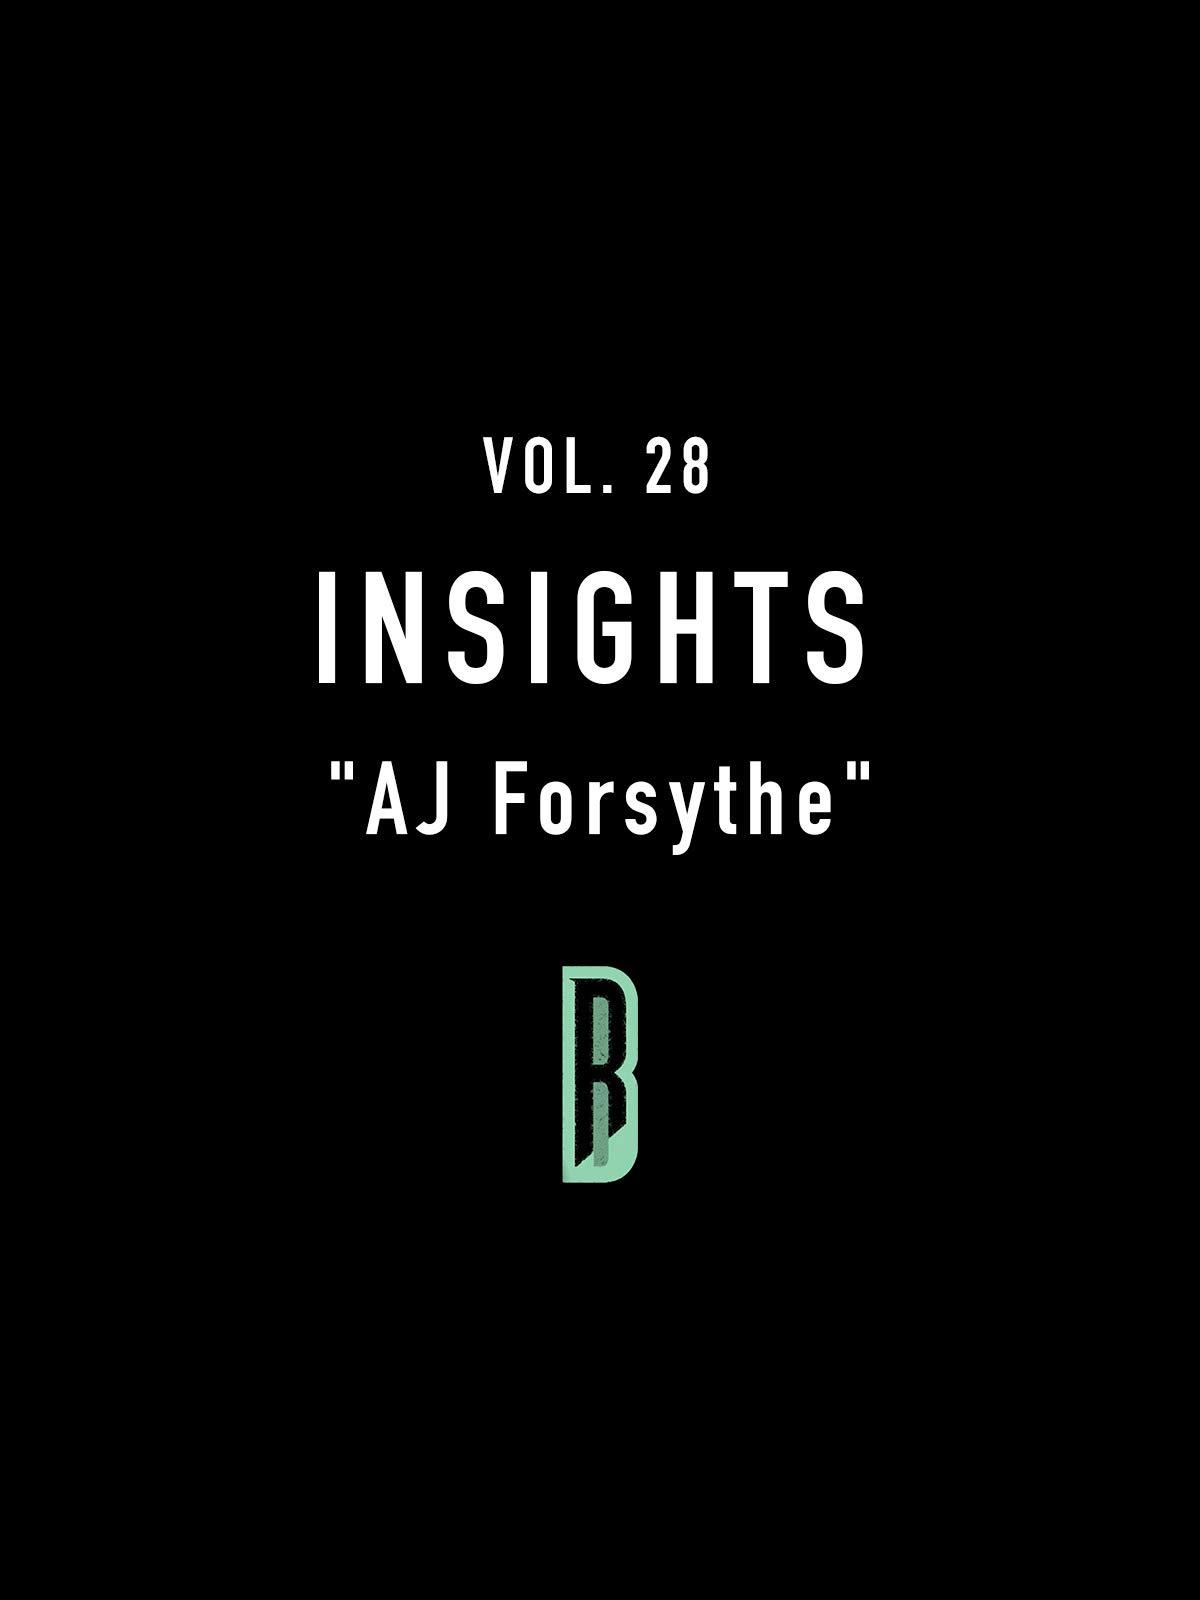 Insights Vol. 28